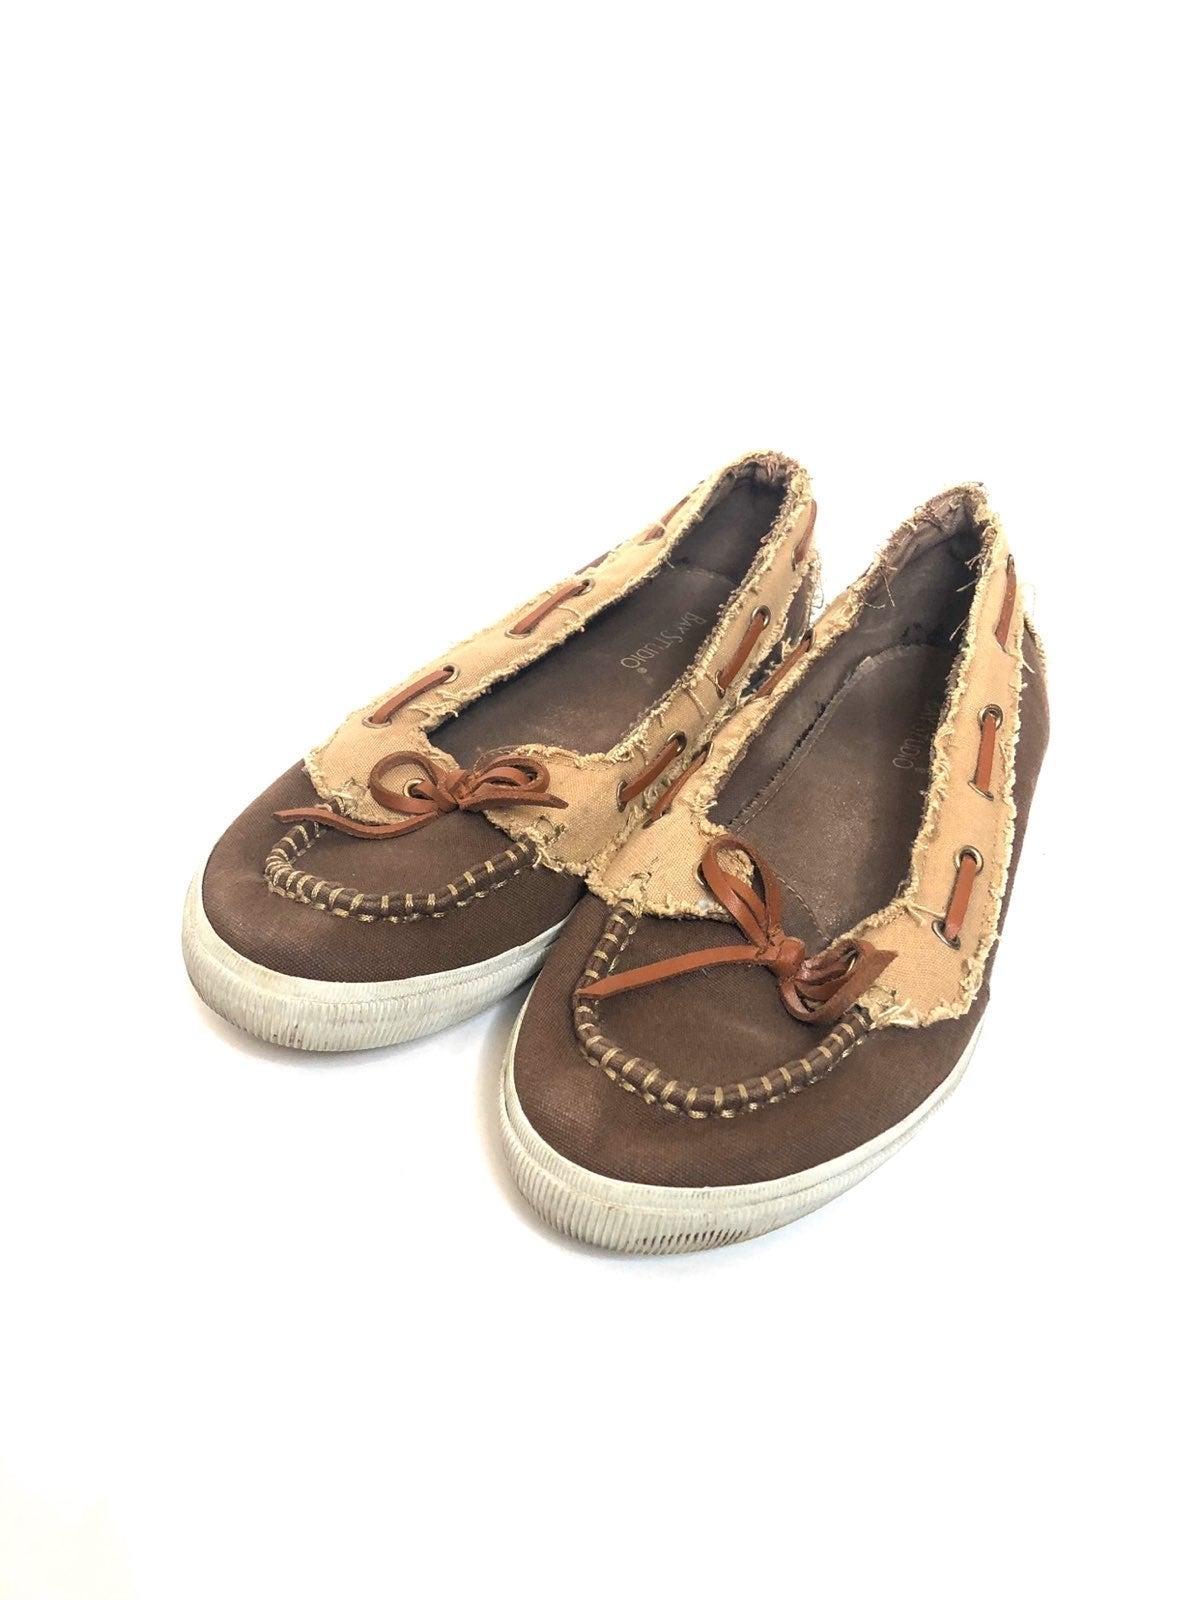 Size 8.5 Bay Studio slip on shoes